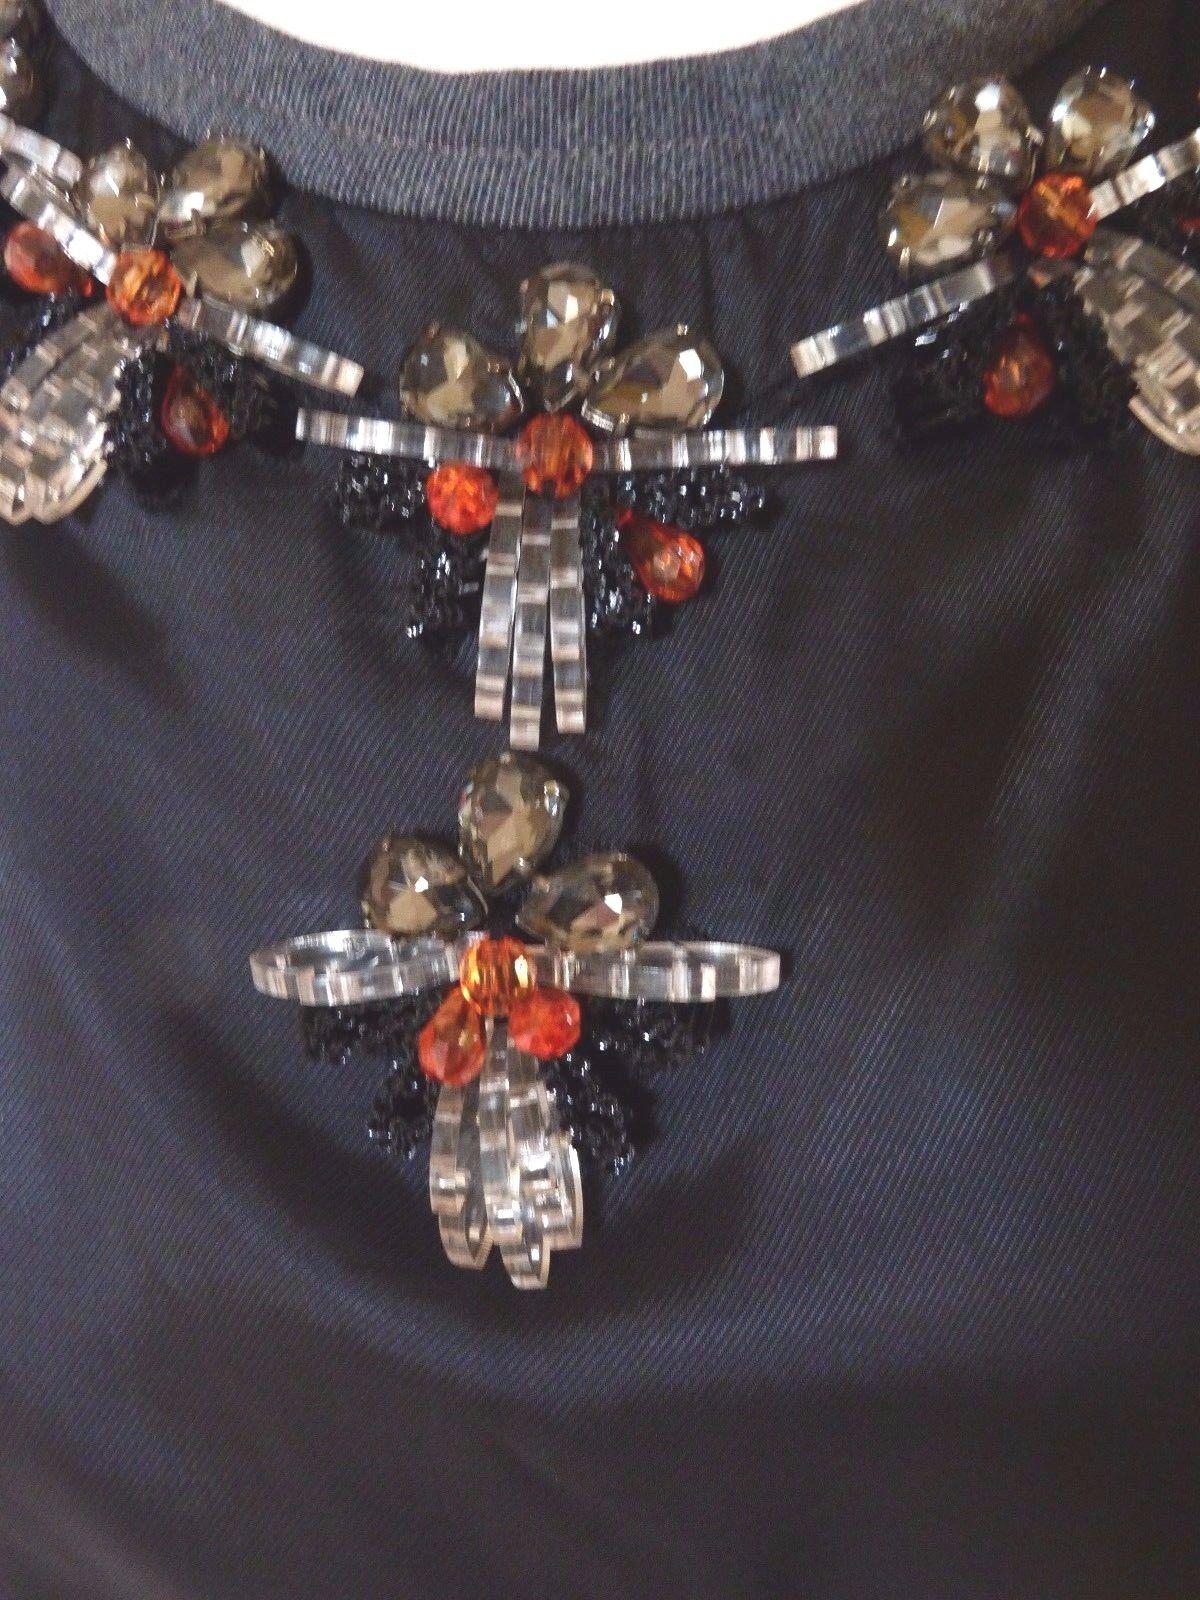 Excelente  Marni Negro Satinado Vestido Joya Adornado Escote Talla 40 Reino Unido 10  venta de ofertas